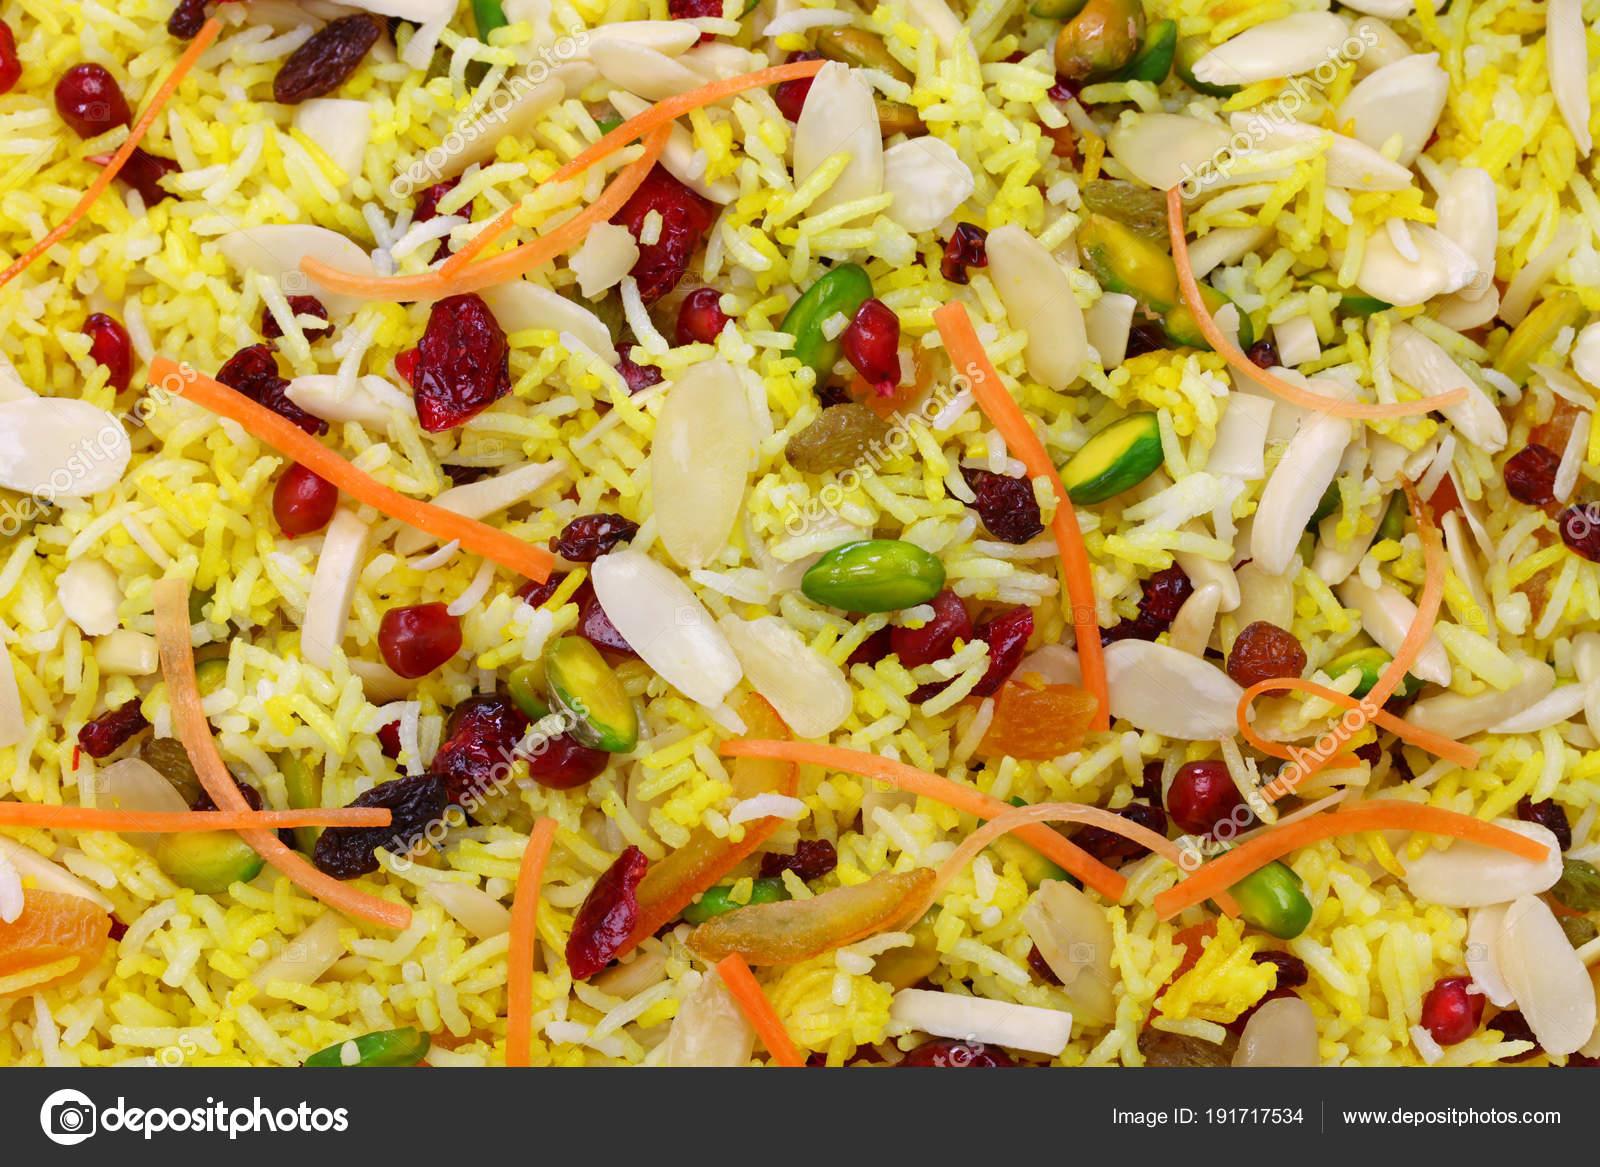 Persische Küche Jeweled Persischen Reis Javaher Polow U2014 Stockfoto